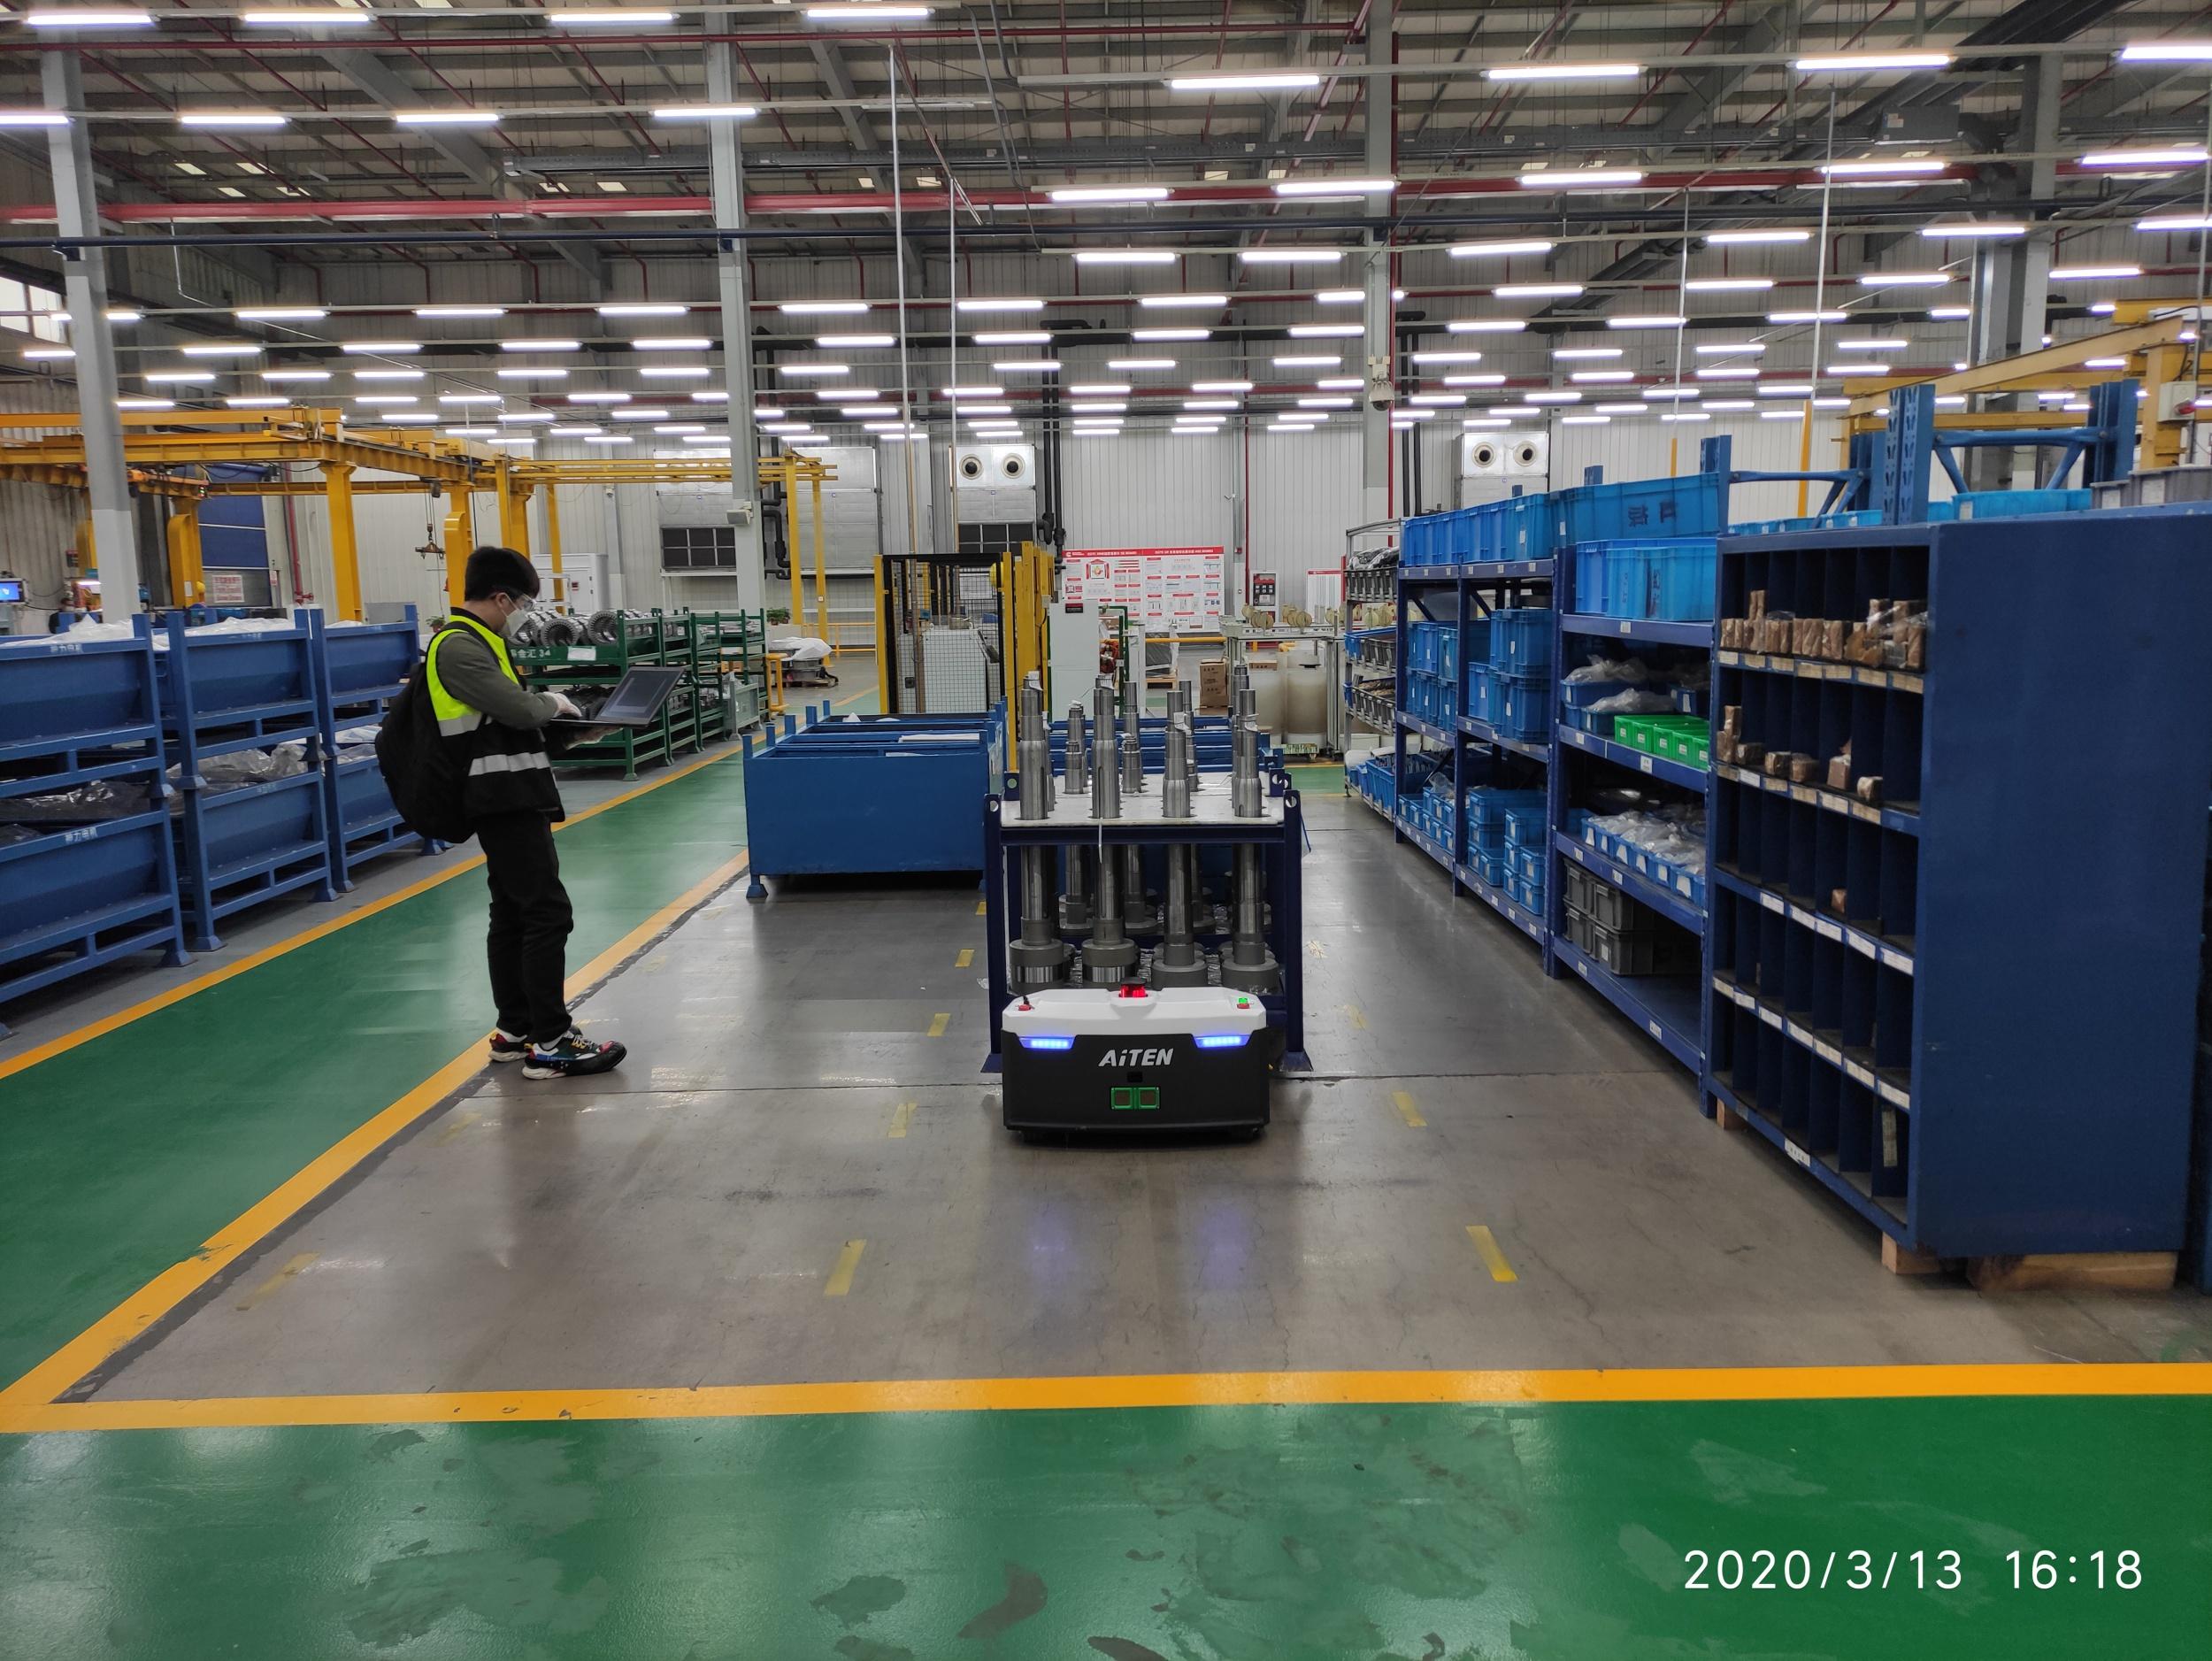 AGV搬运小车,上海叉车,无人叉车,激光导航,叉车agv,仓储机器人,自动小车AGV叉车公司